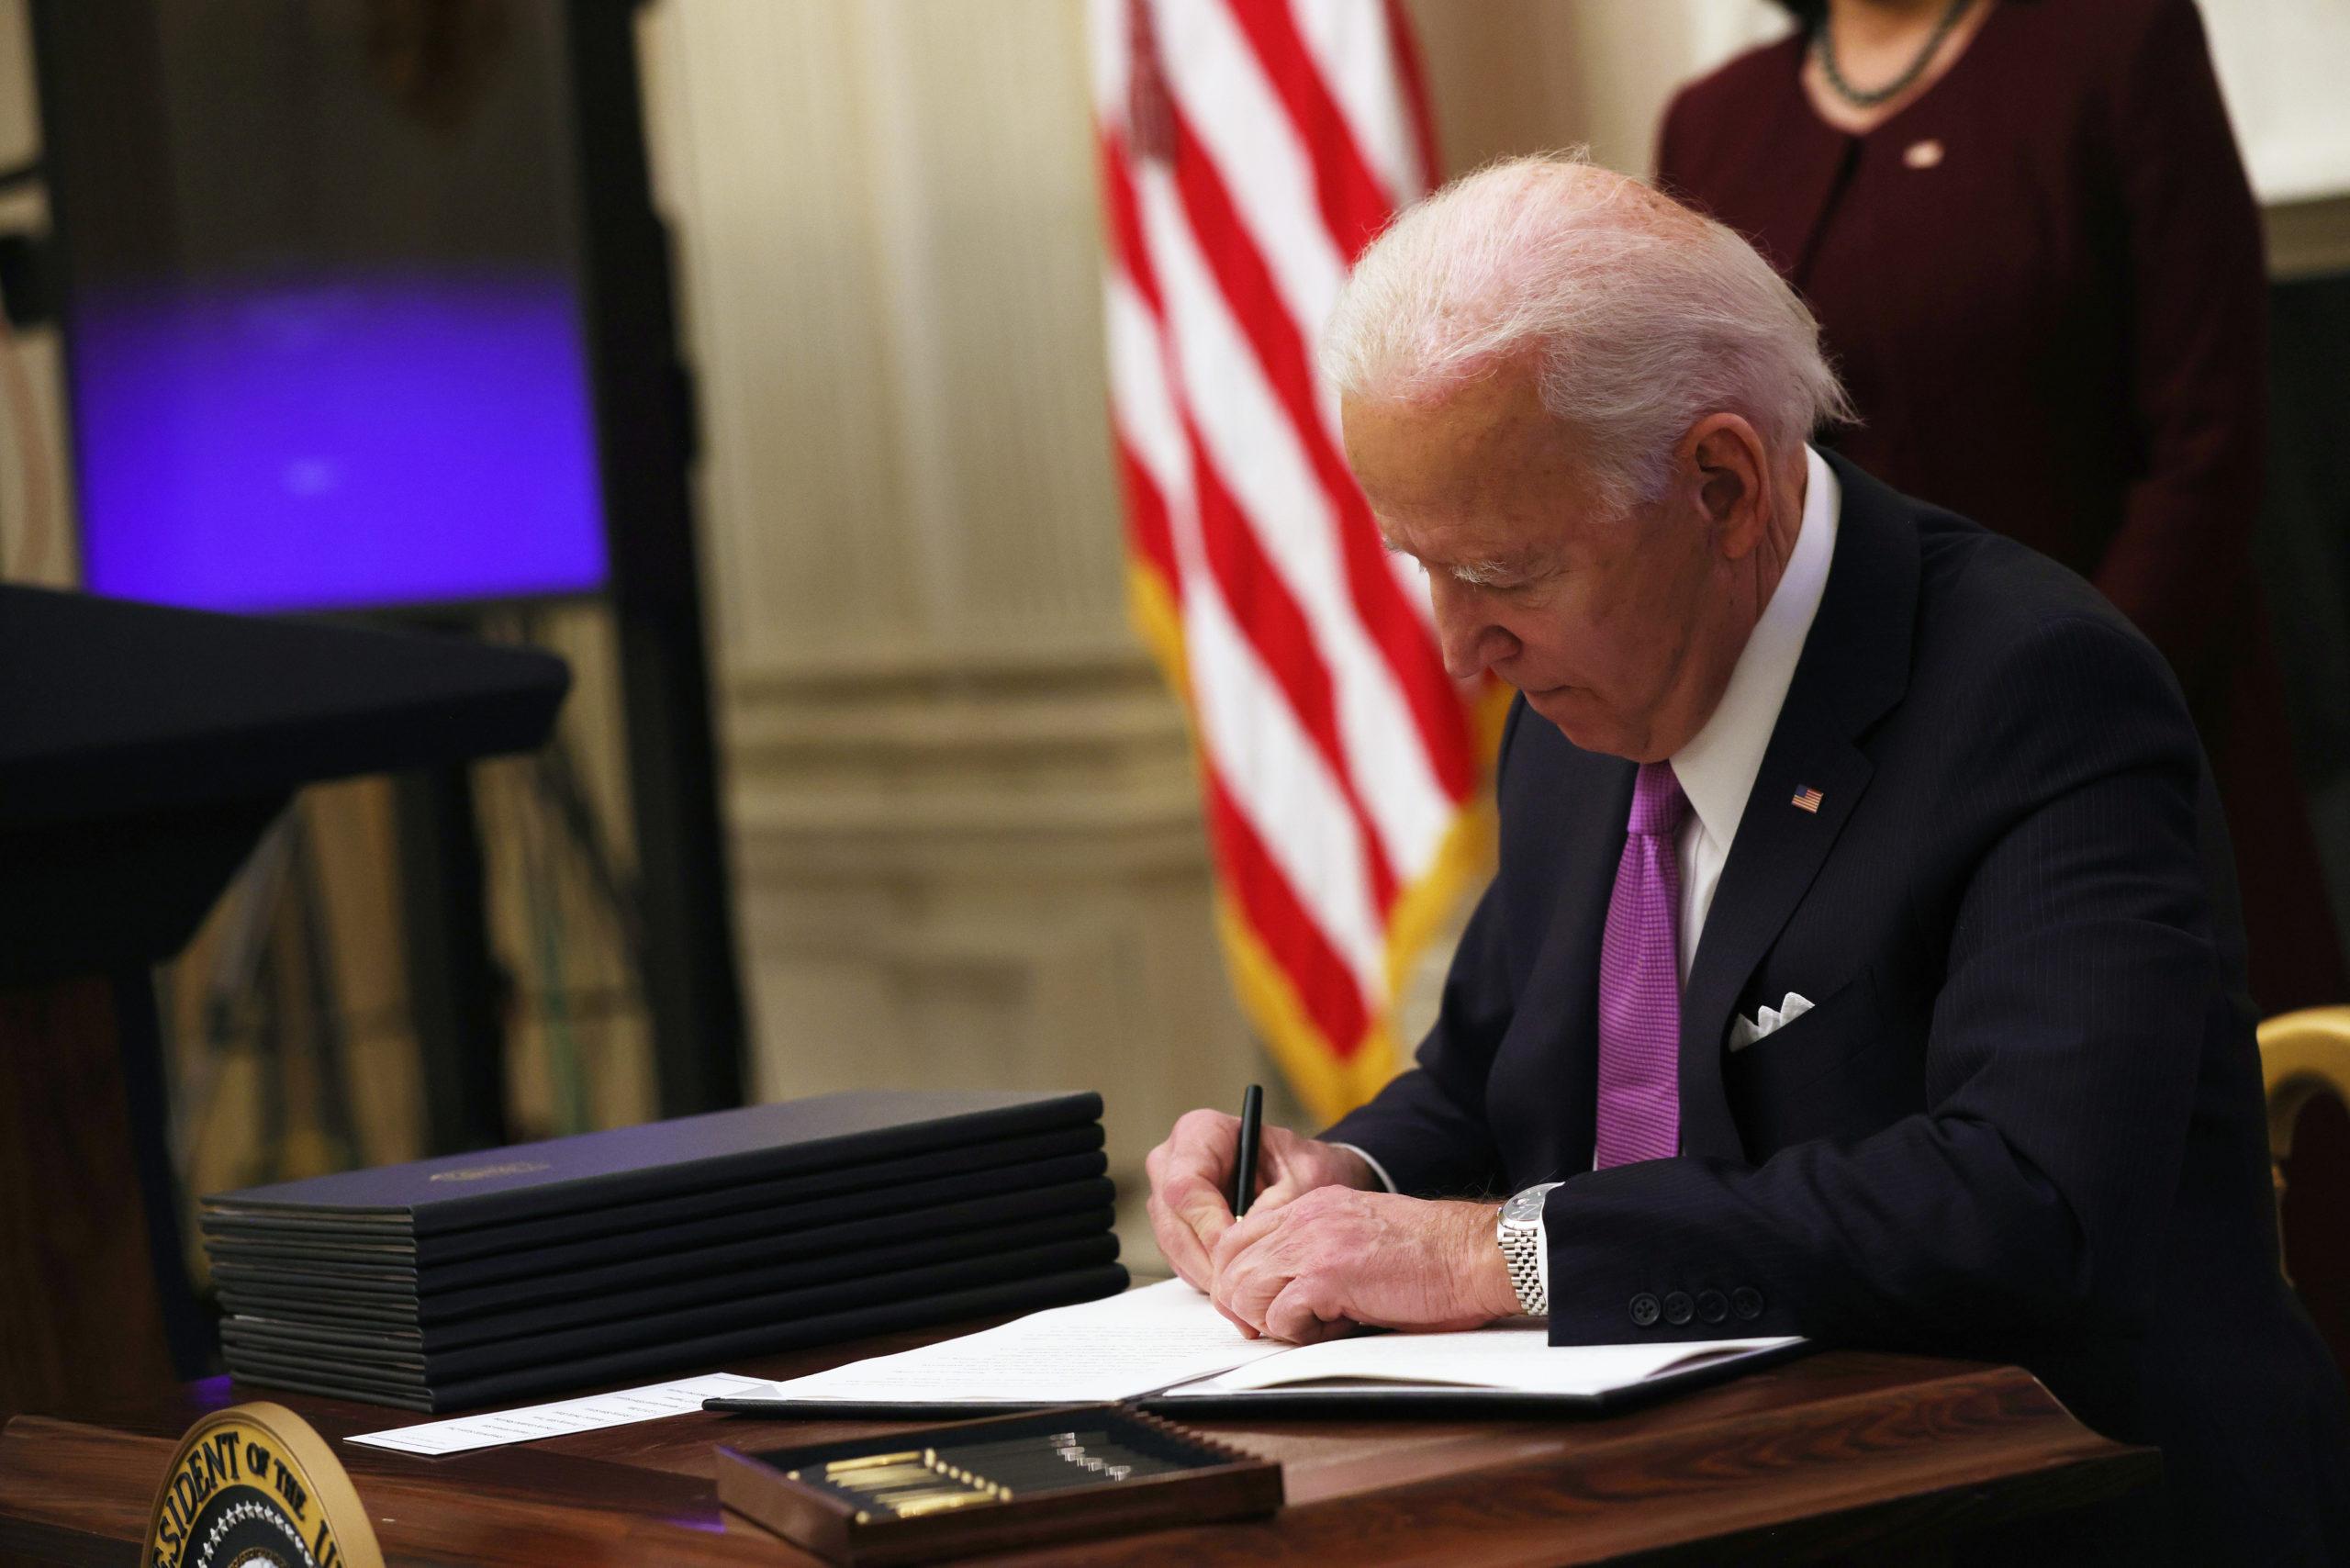 President Joe Biden signs an executive order on Jan. 21. (Alex Wong/Getty Images)